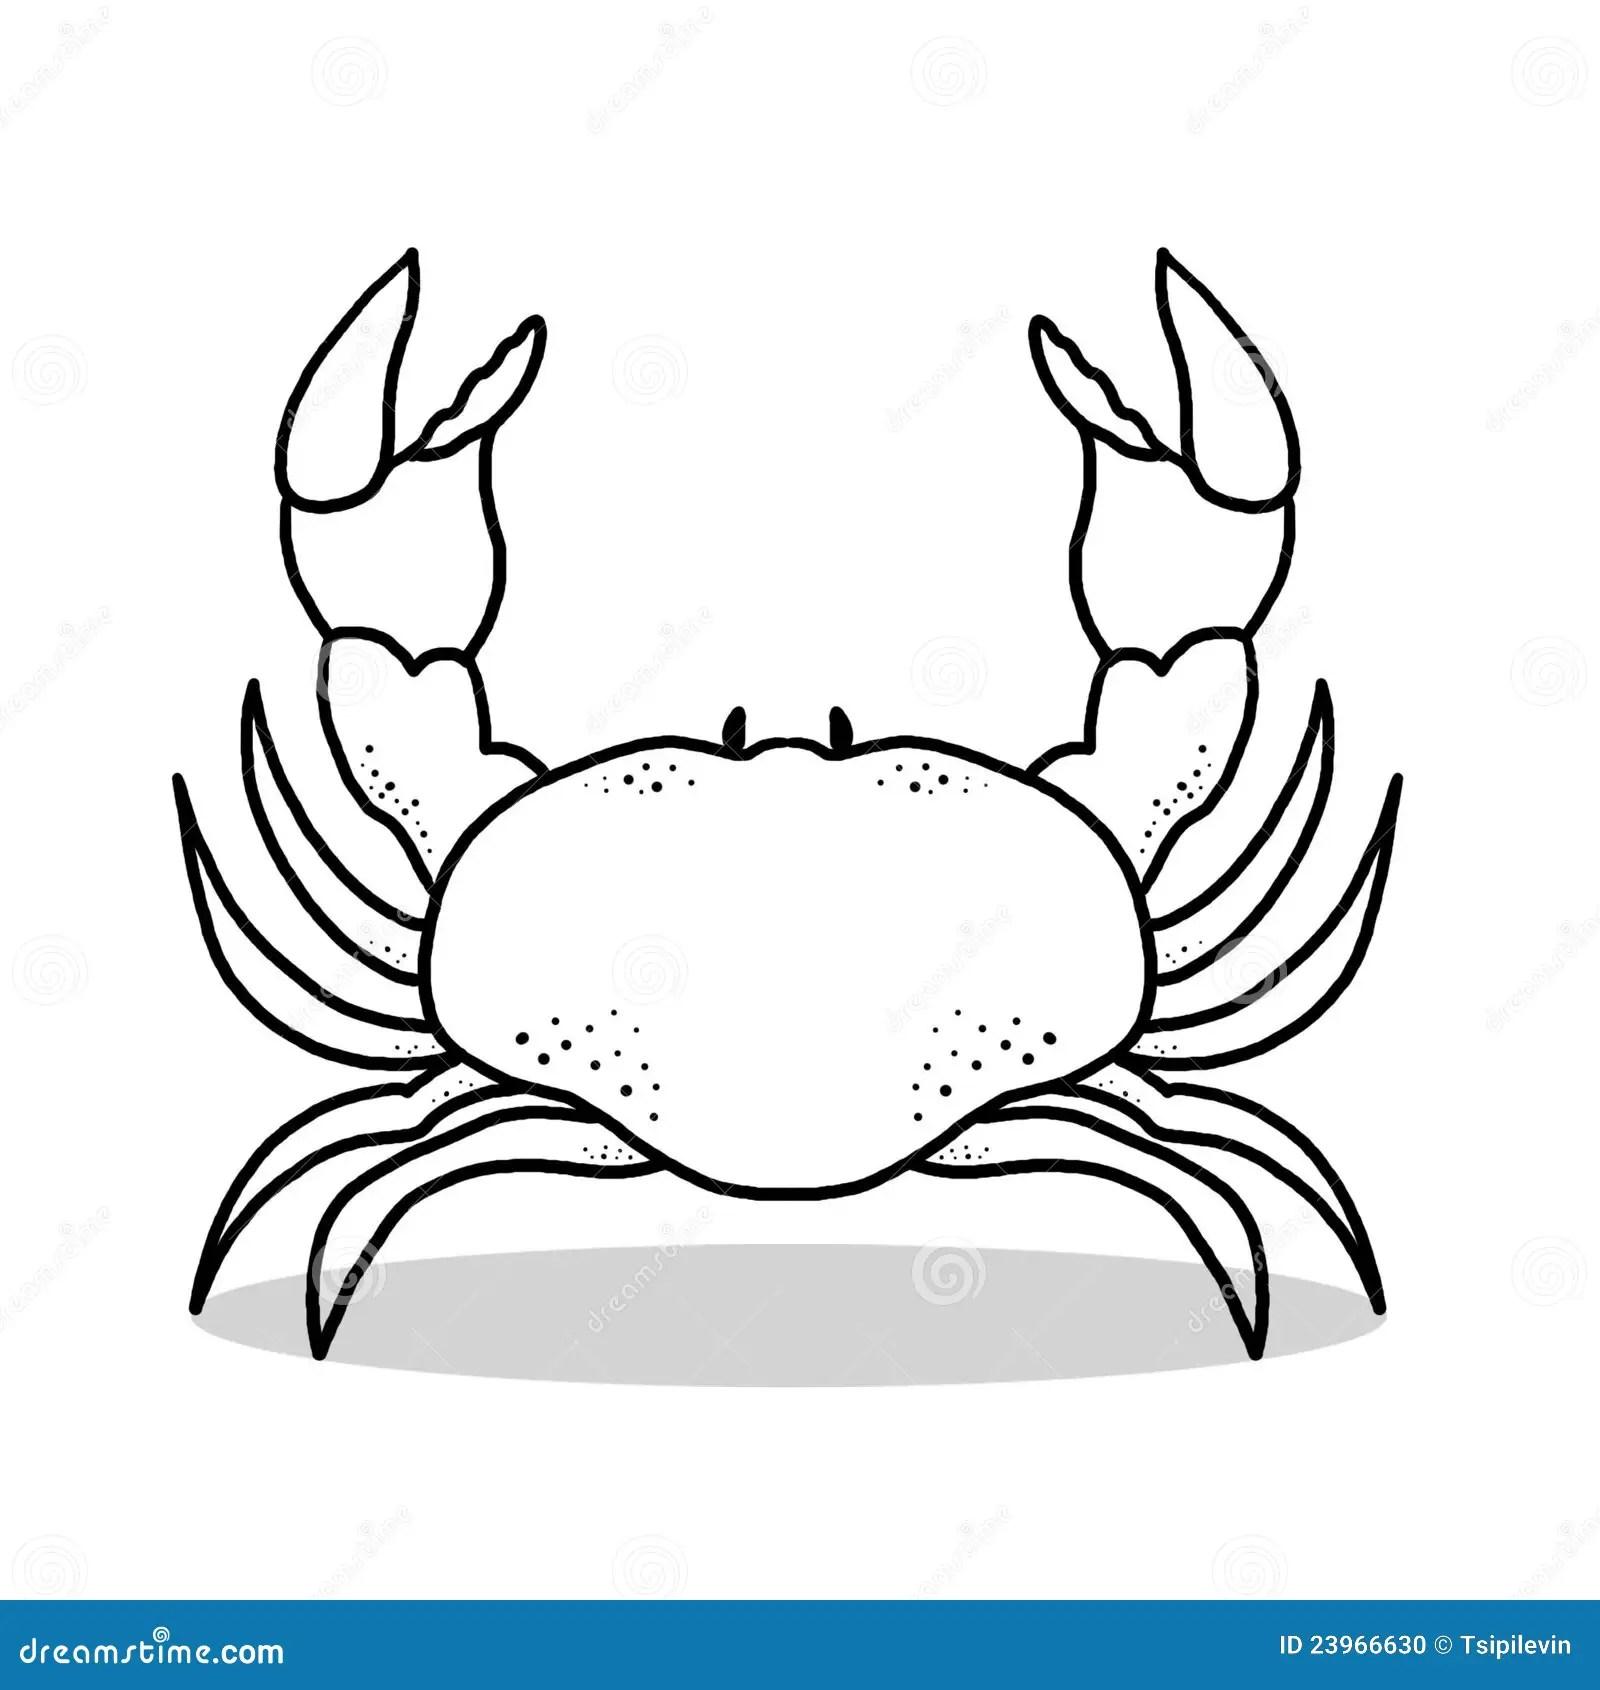 Crab Outline Illustration Stock Illustration Illustration